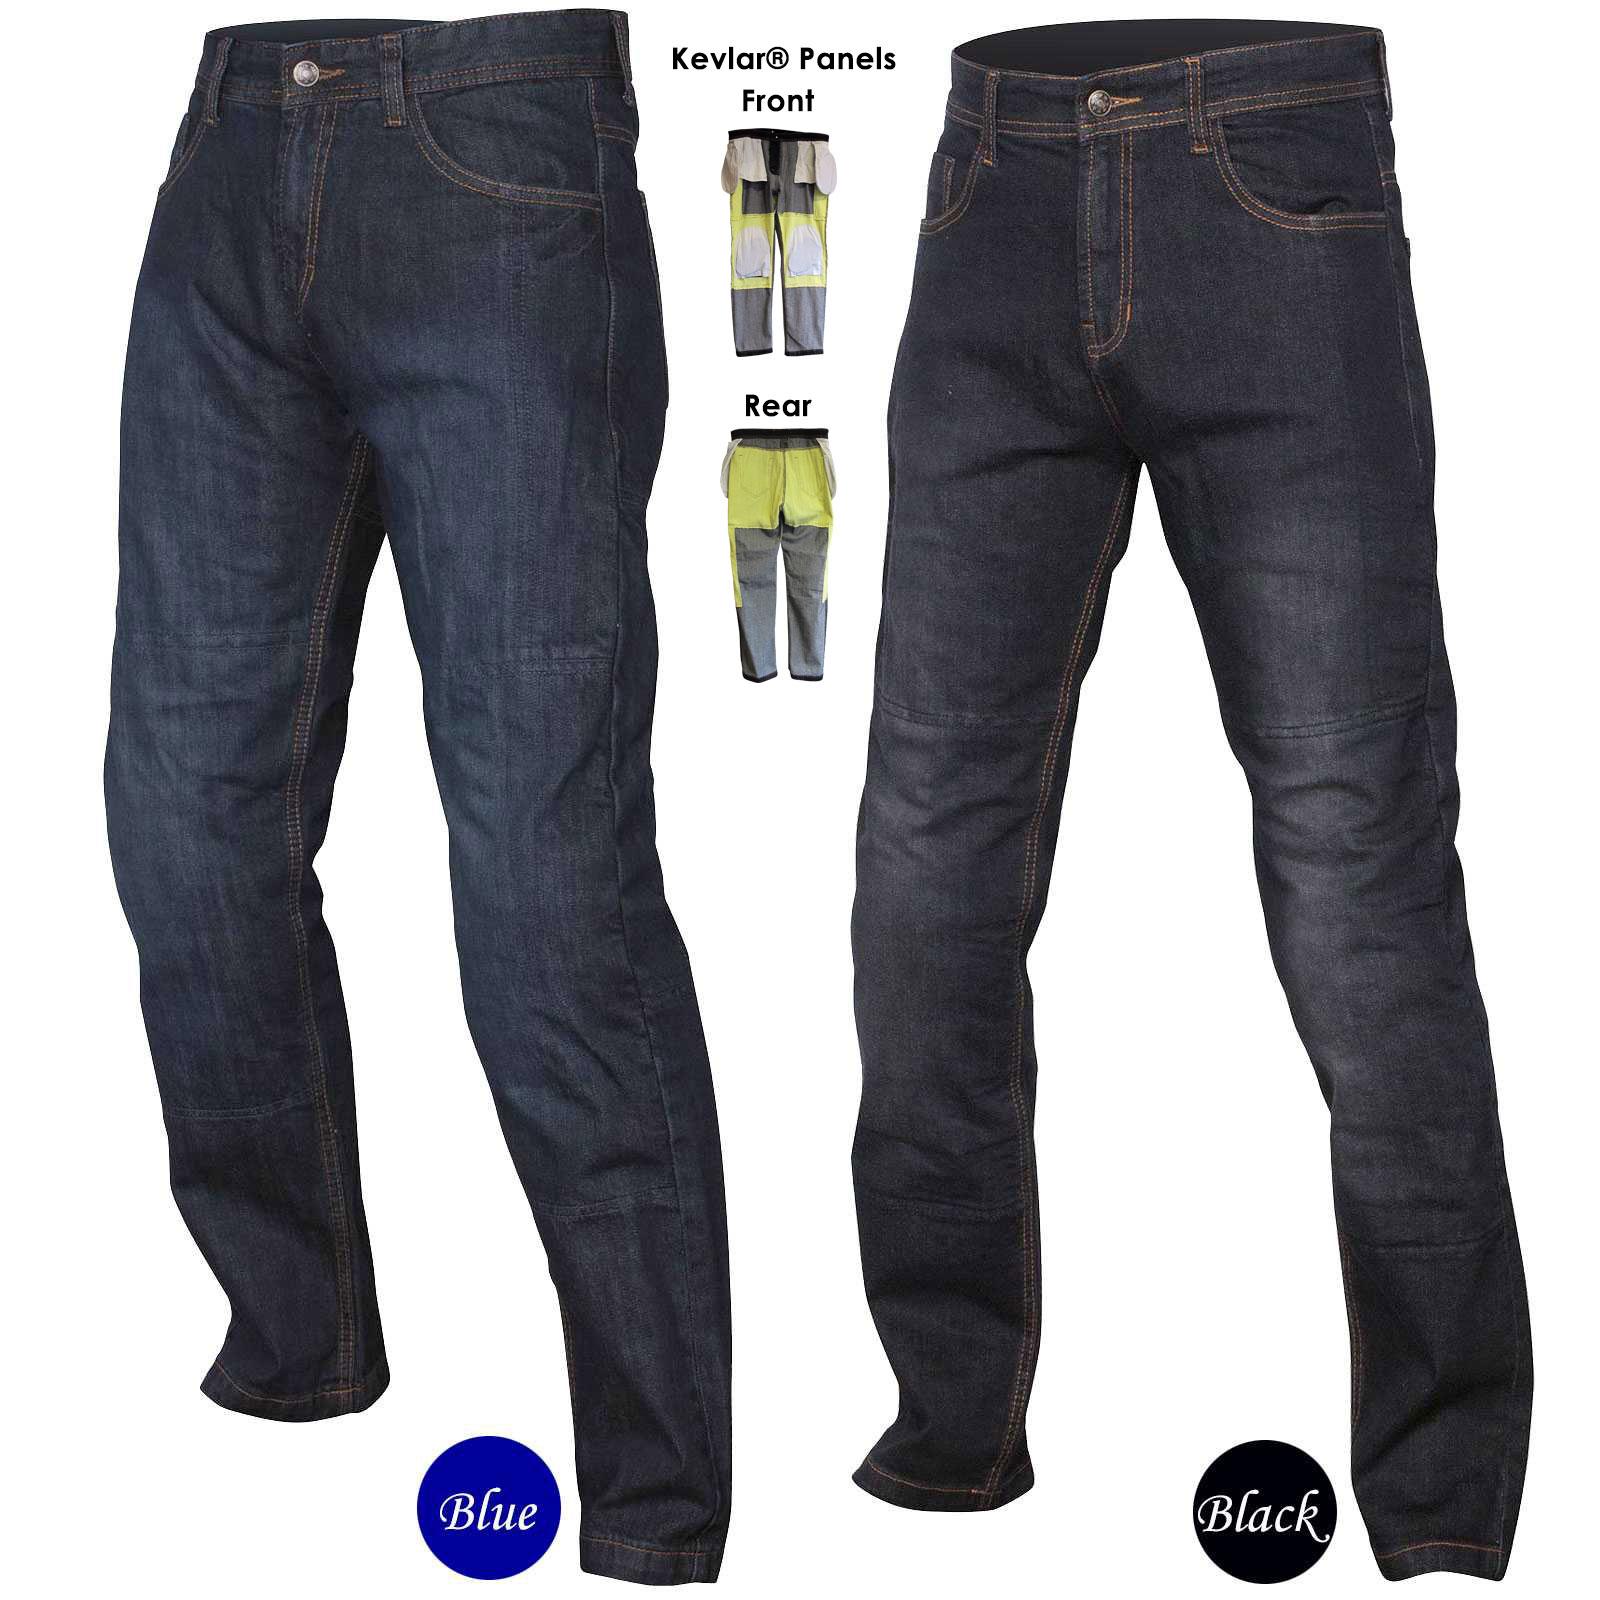 men 39 s kevlar motorbike motorcycle protective trousers pants jeans black or blue ebay. Black Bedroom Furniture Sets. Home Design Ideas